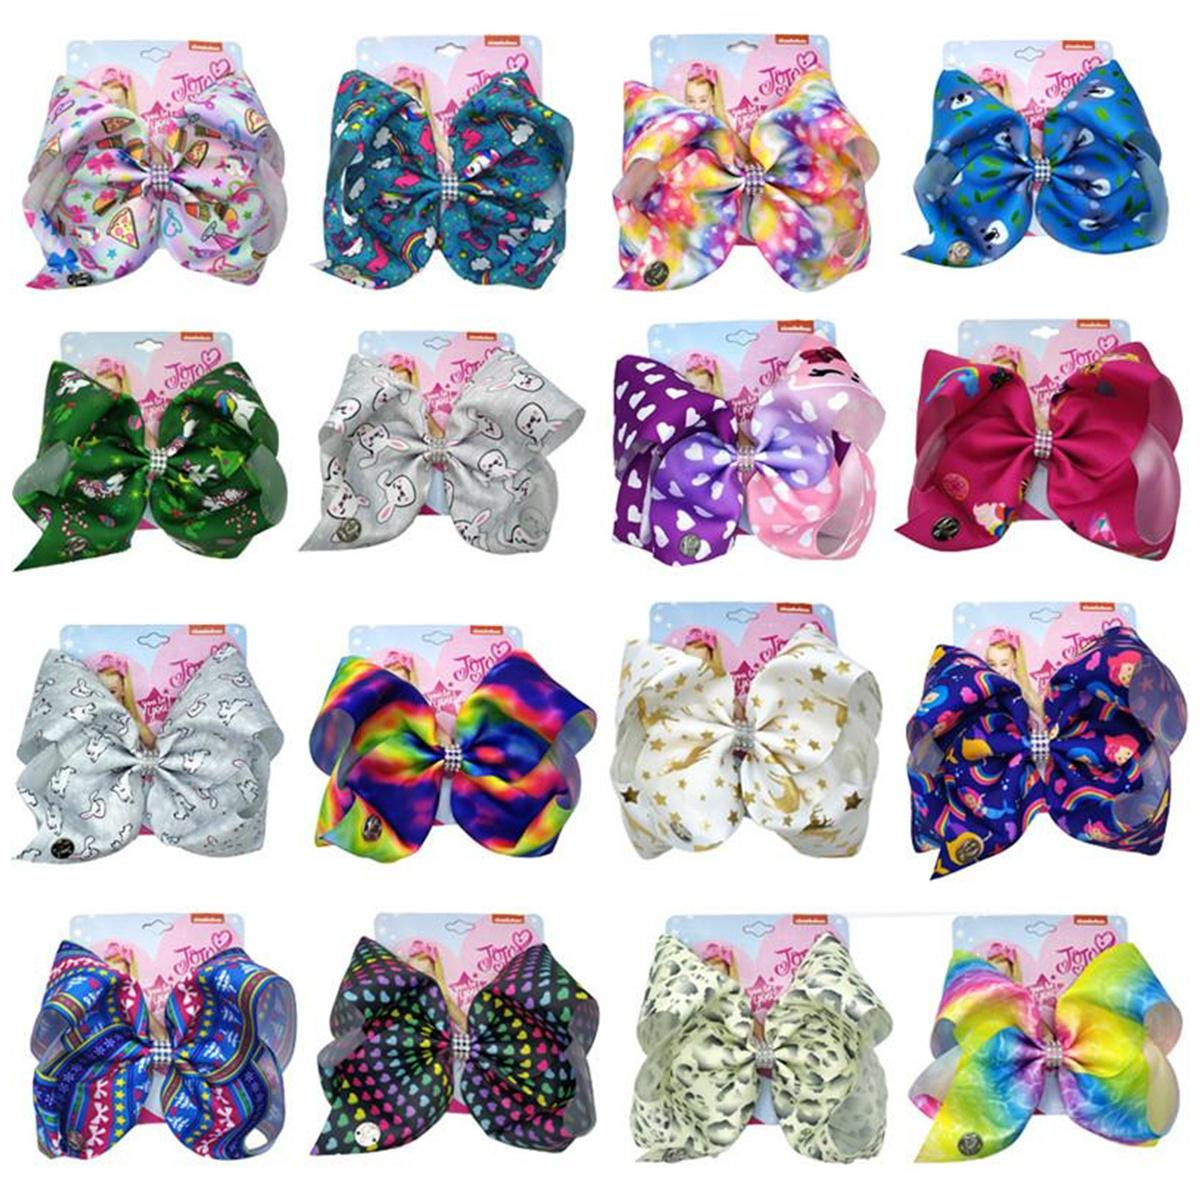 Мода Девушки Swia Bow Hair Clip Bows Bowlfly Knot Hairclip Barnettes Для Детских Художник Прикосновение Прикосновение Волос Аксессуар с картонными подарками